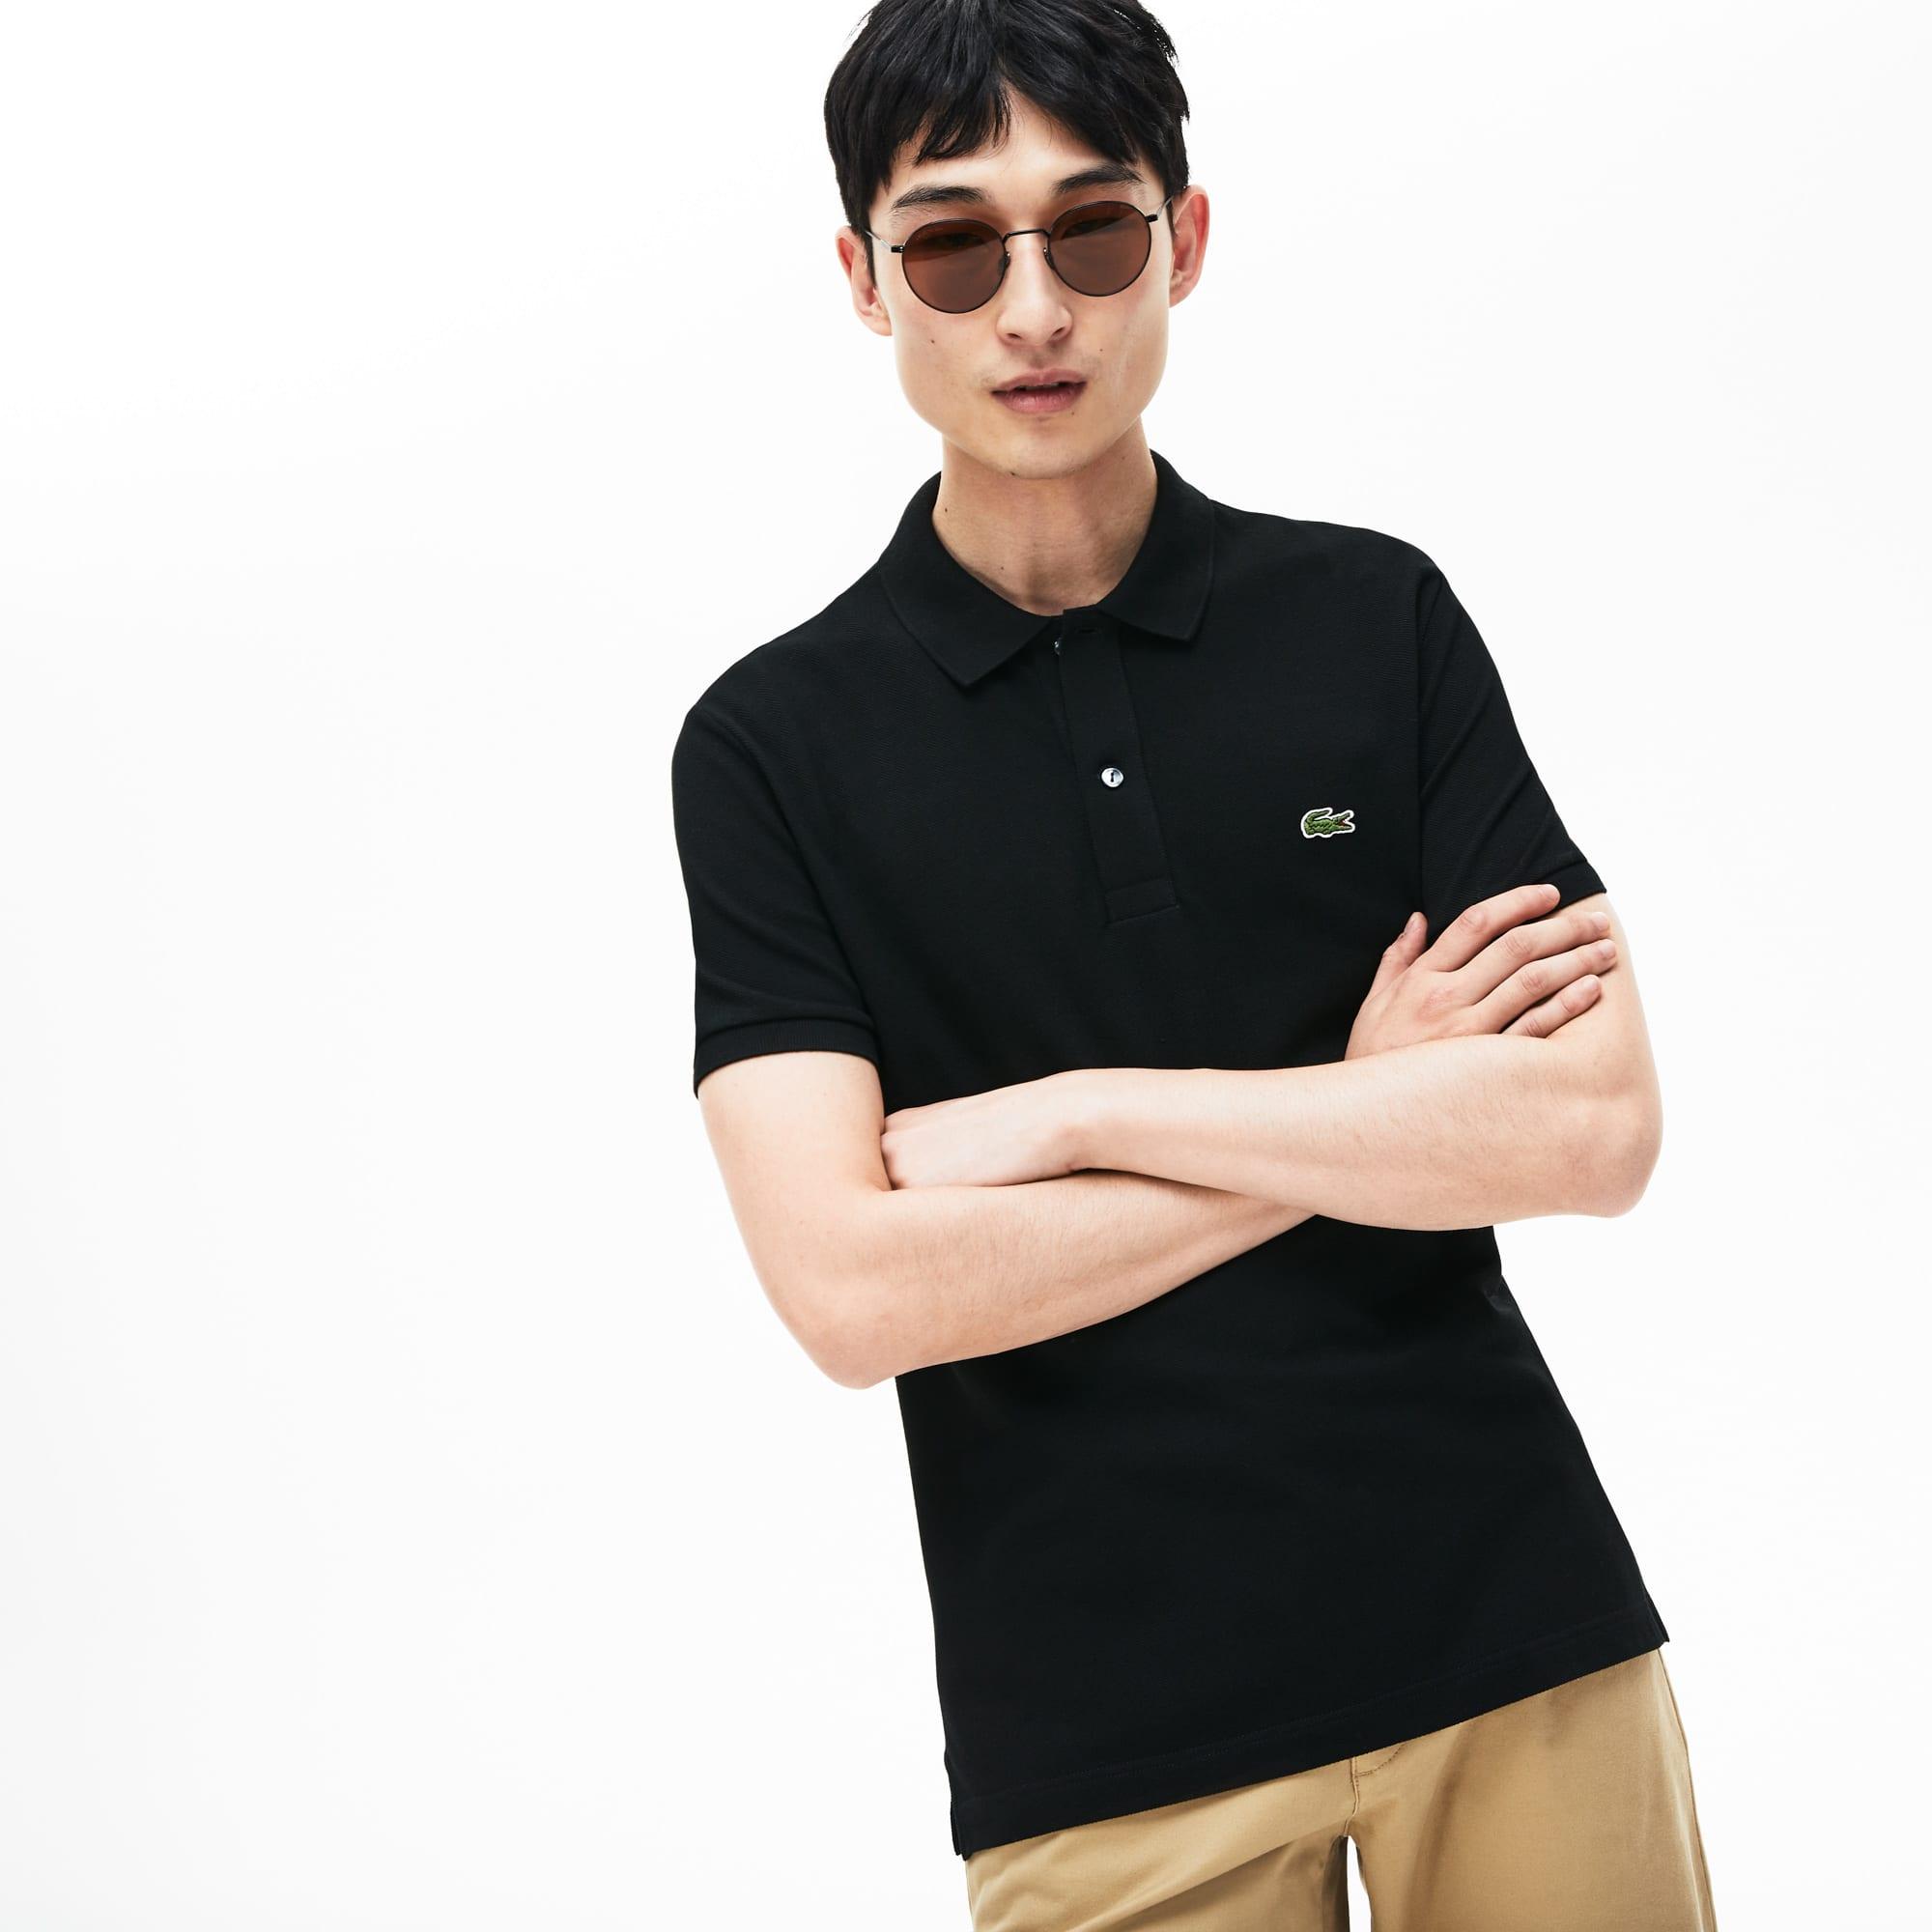 caee41640a8c7a Men's Slim fit Lacoste Polo Shirt in petit piqué | LACOSTE